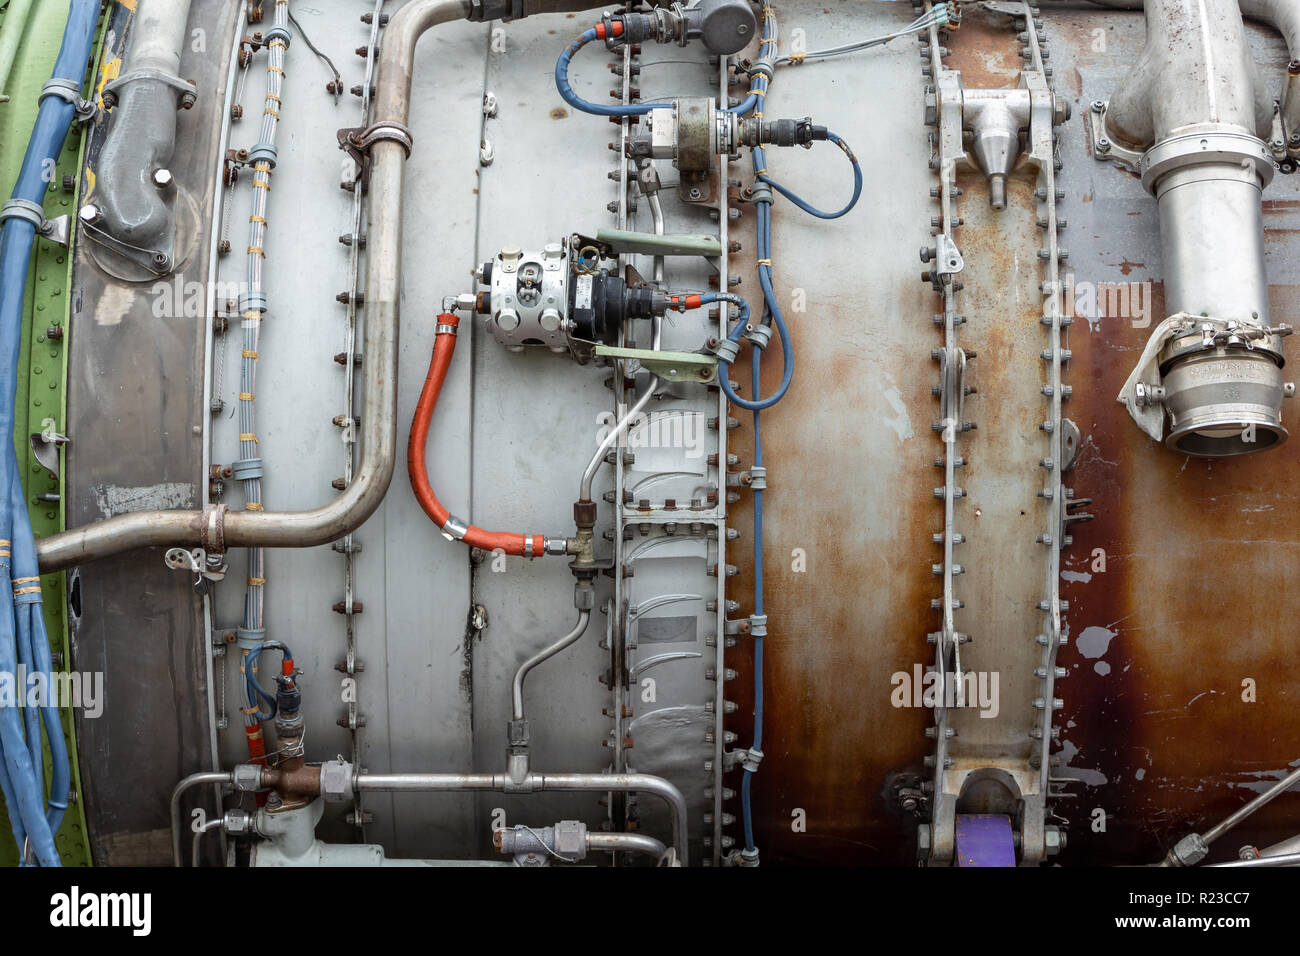 Detail of the side of a turbofan jet engine - Pembroke Pines, Florida, USA - Stock Image